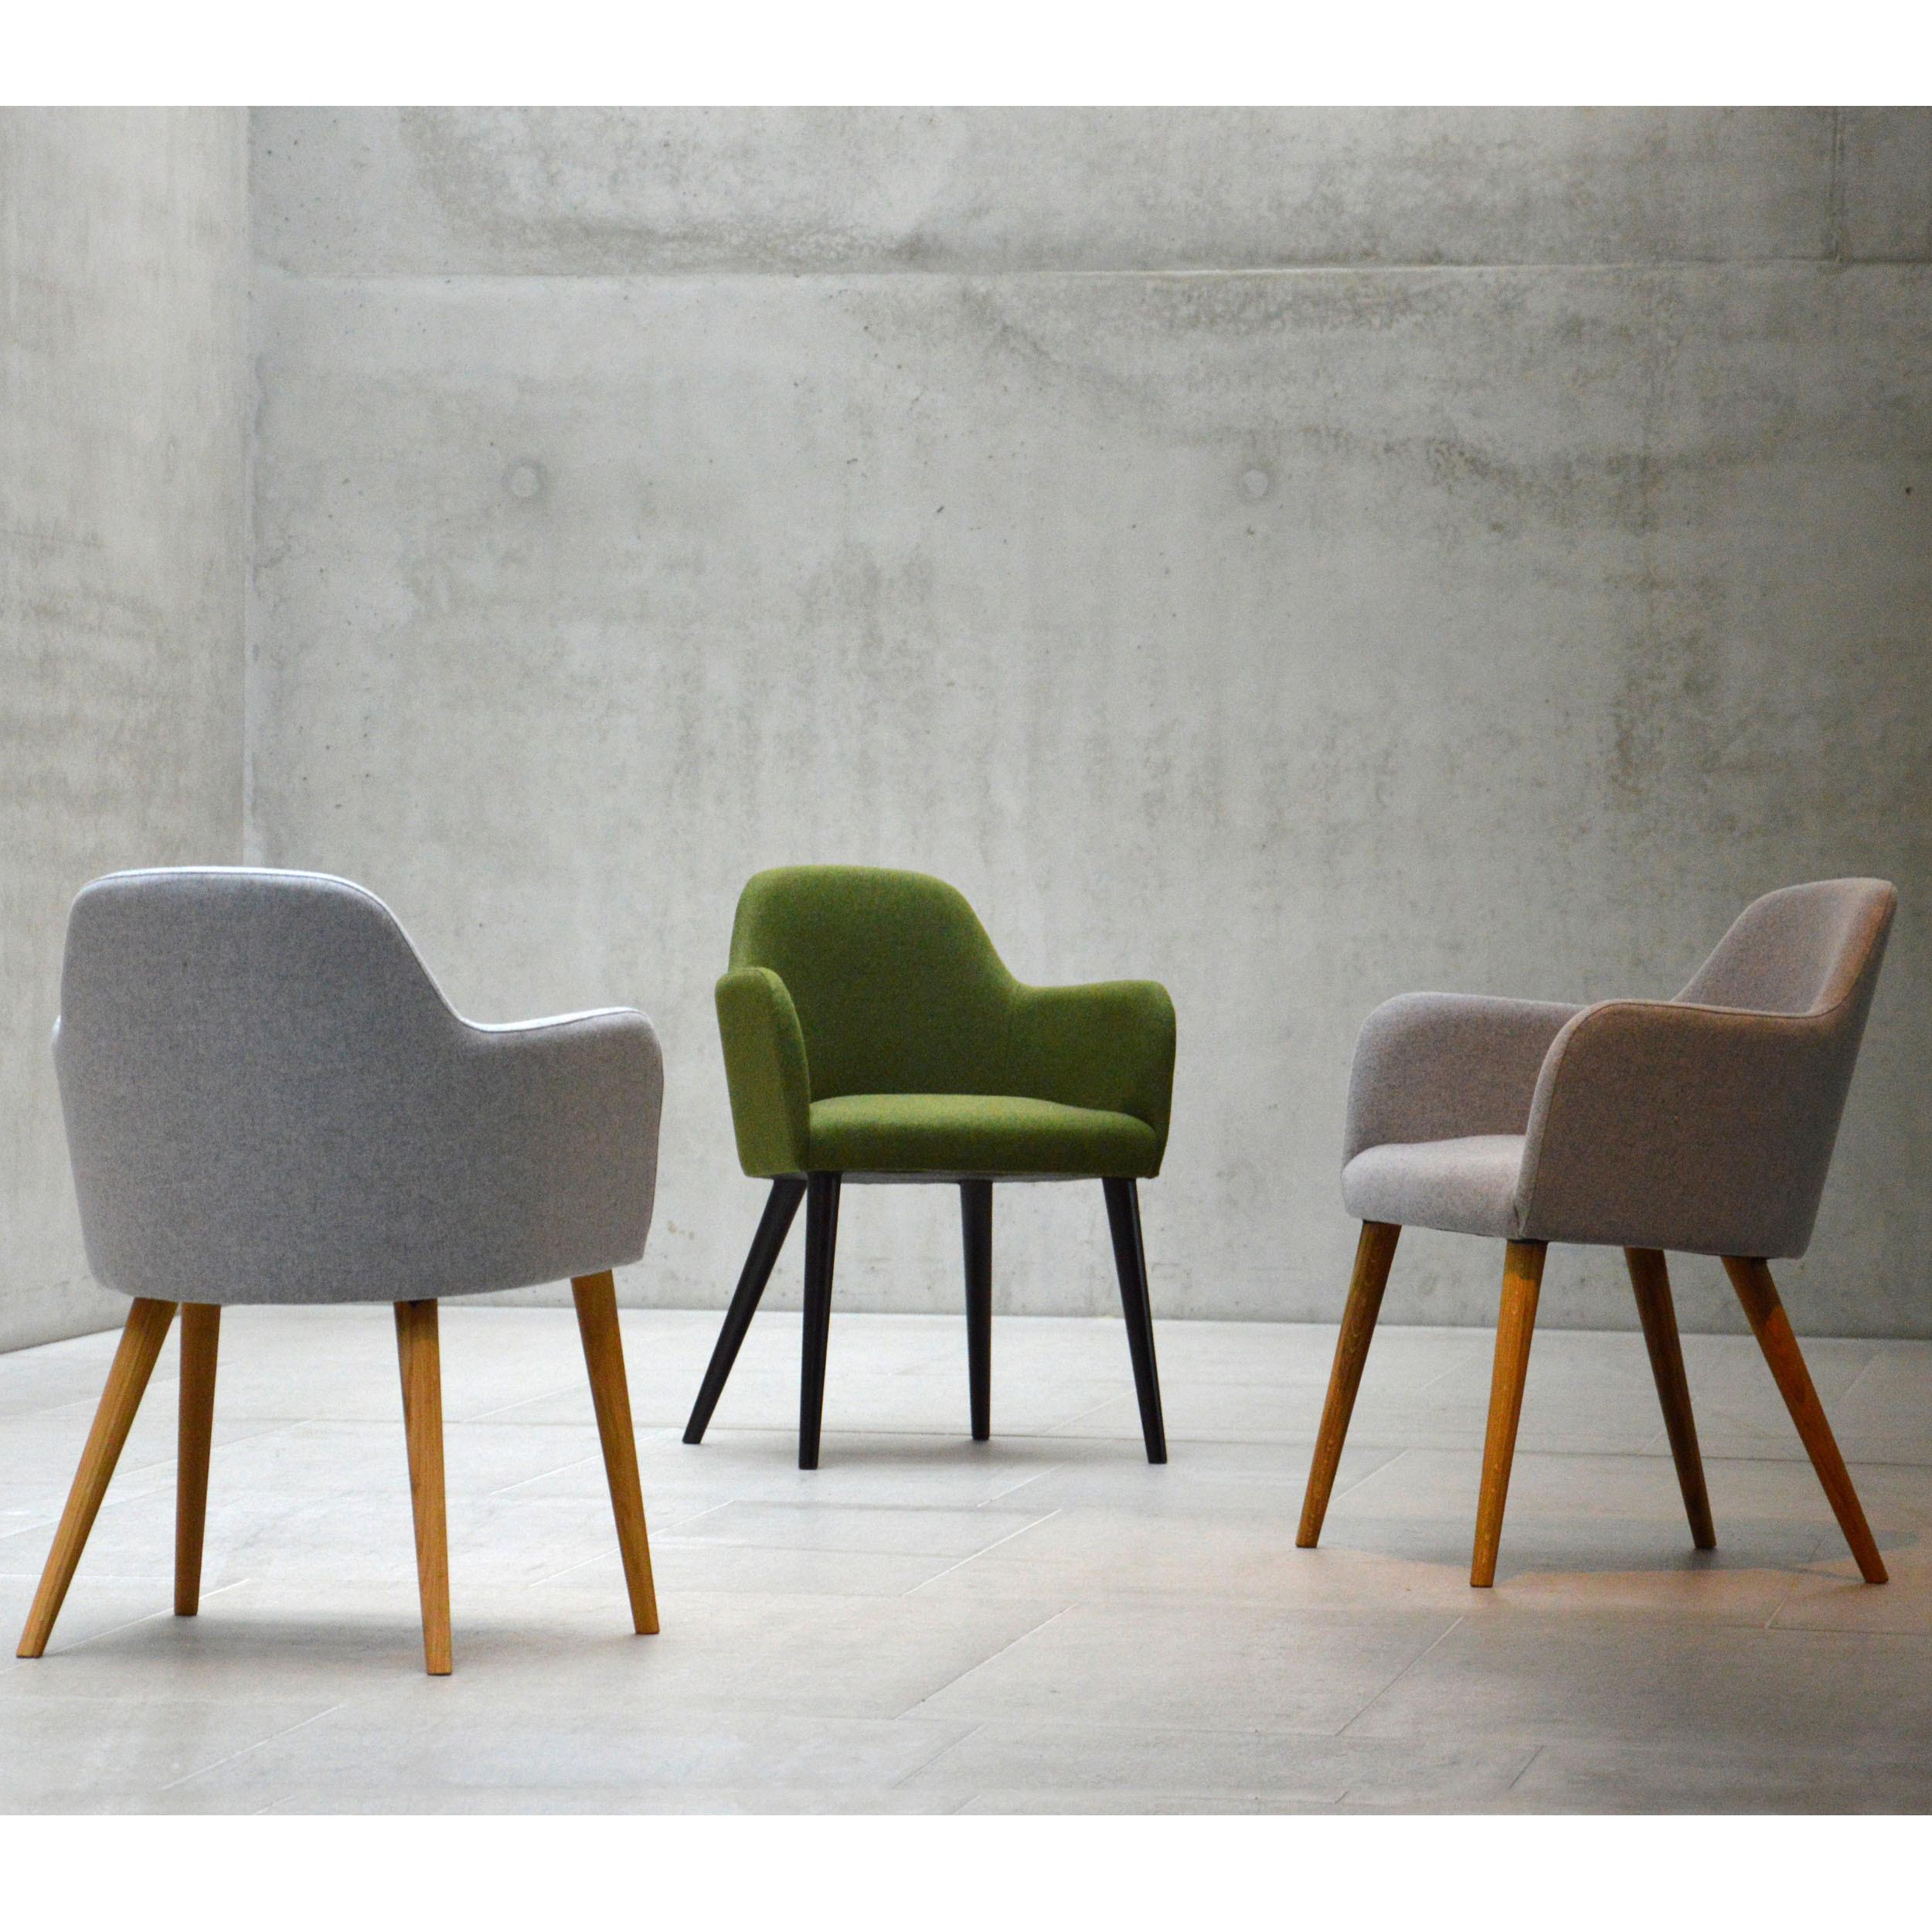 flaminia polsterstuhl eiche dunkelbraun. Black Bedroom Furniture Sets. Home Design Ideas